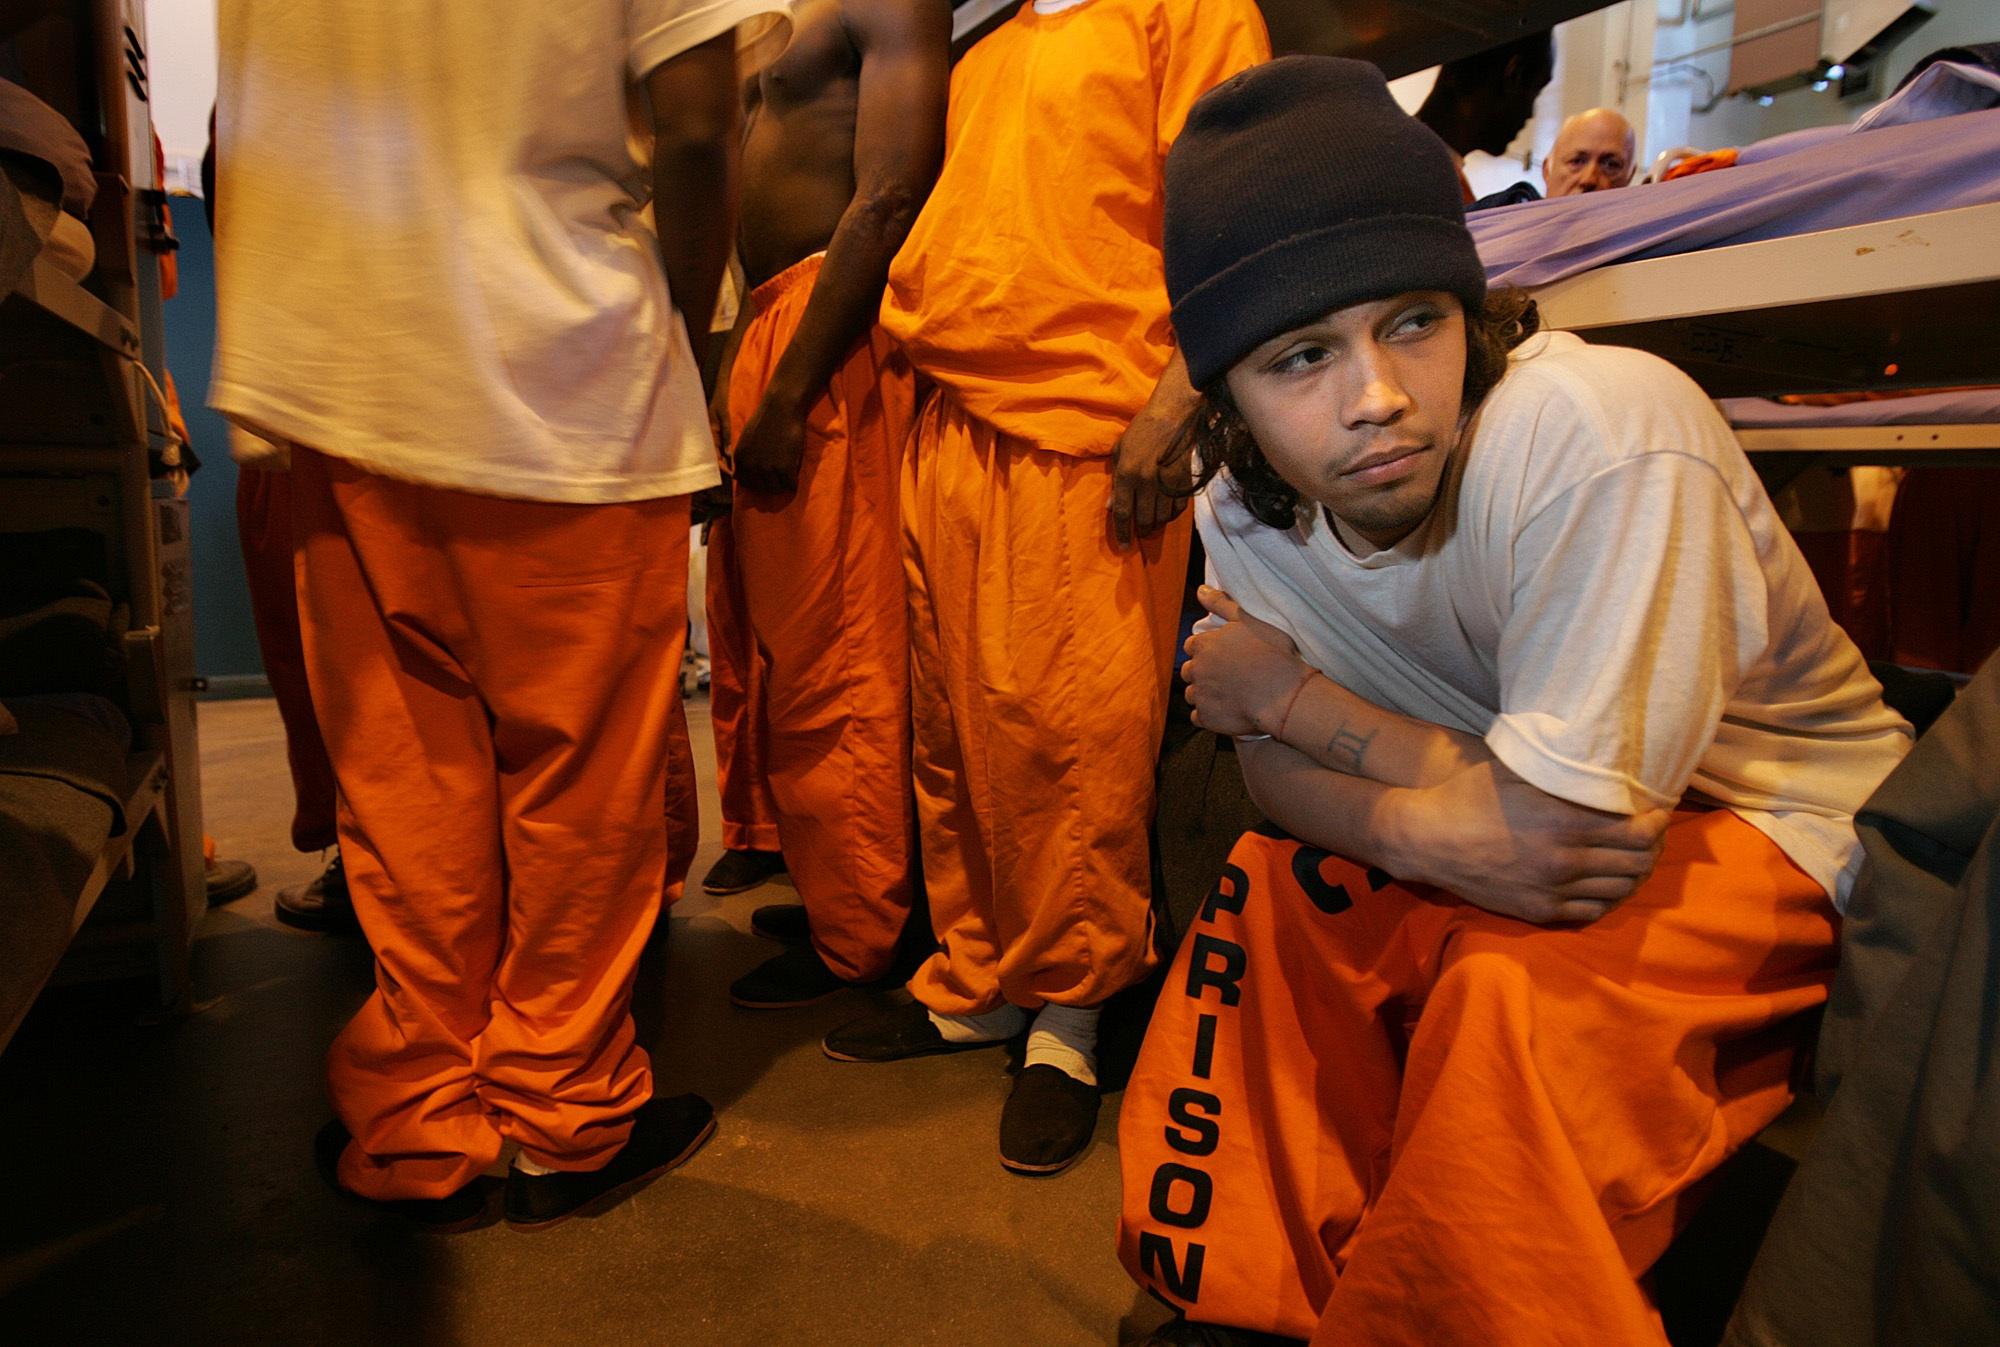 Prison inmate